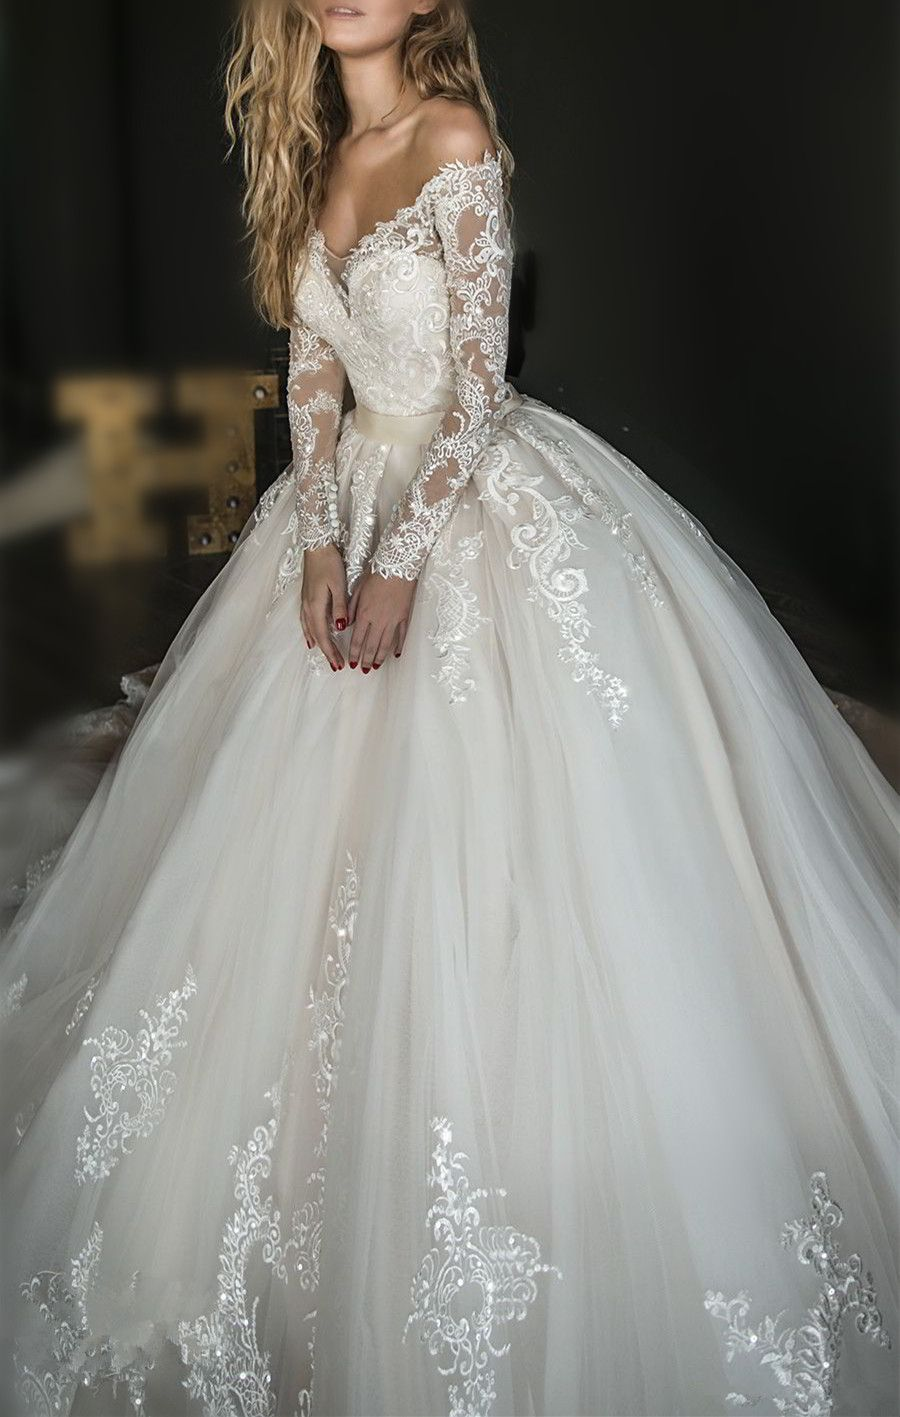 2018 Elegant White Lace Off Shoulder Wedding Dress Long Sleeves Appliques Bridal Bridal Dresses Lace Off Shoulder Wedding Dress Lace Off Shoulder Wedding Dress [ 1417 x 900 Pixel ]